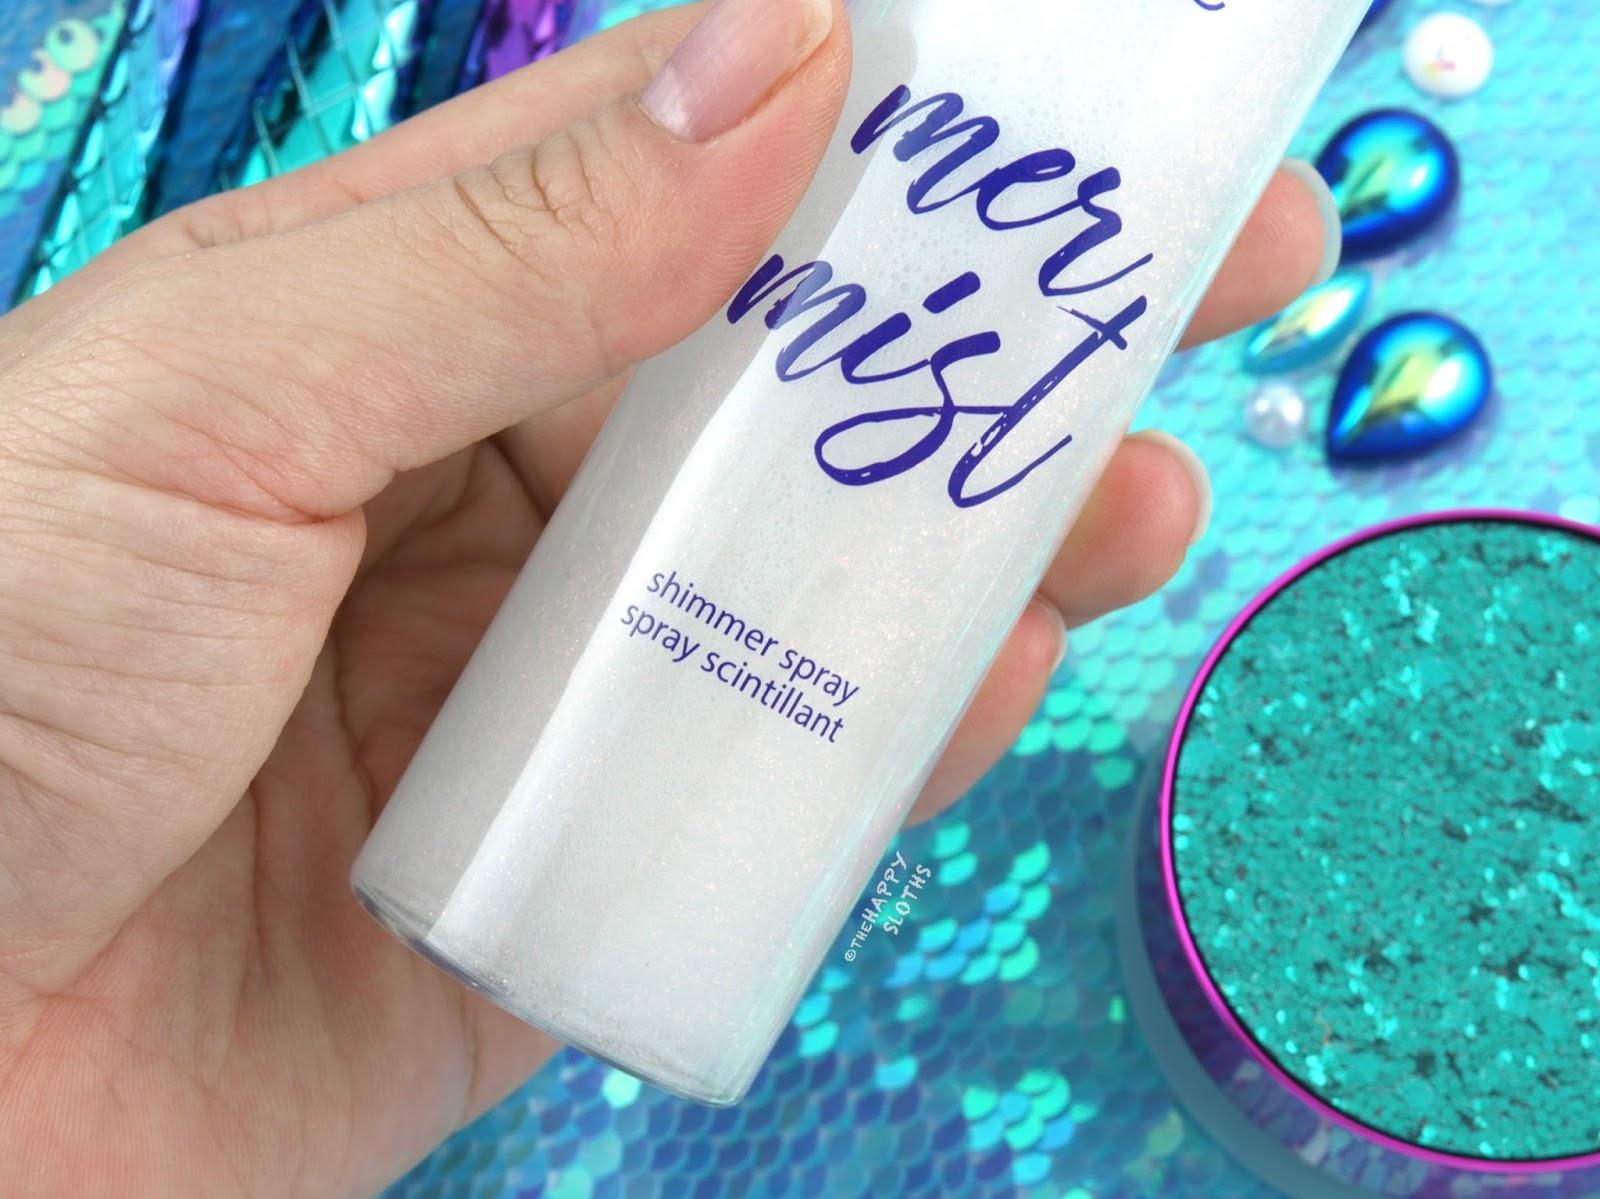 Tarte Mermaid Collection | Mer-mist Shimmer Spray: Review